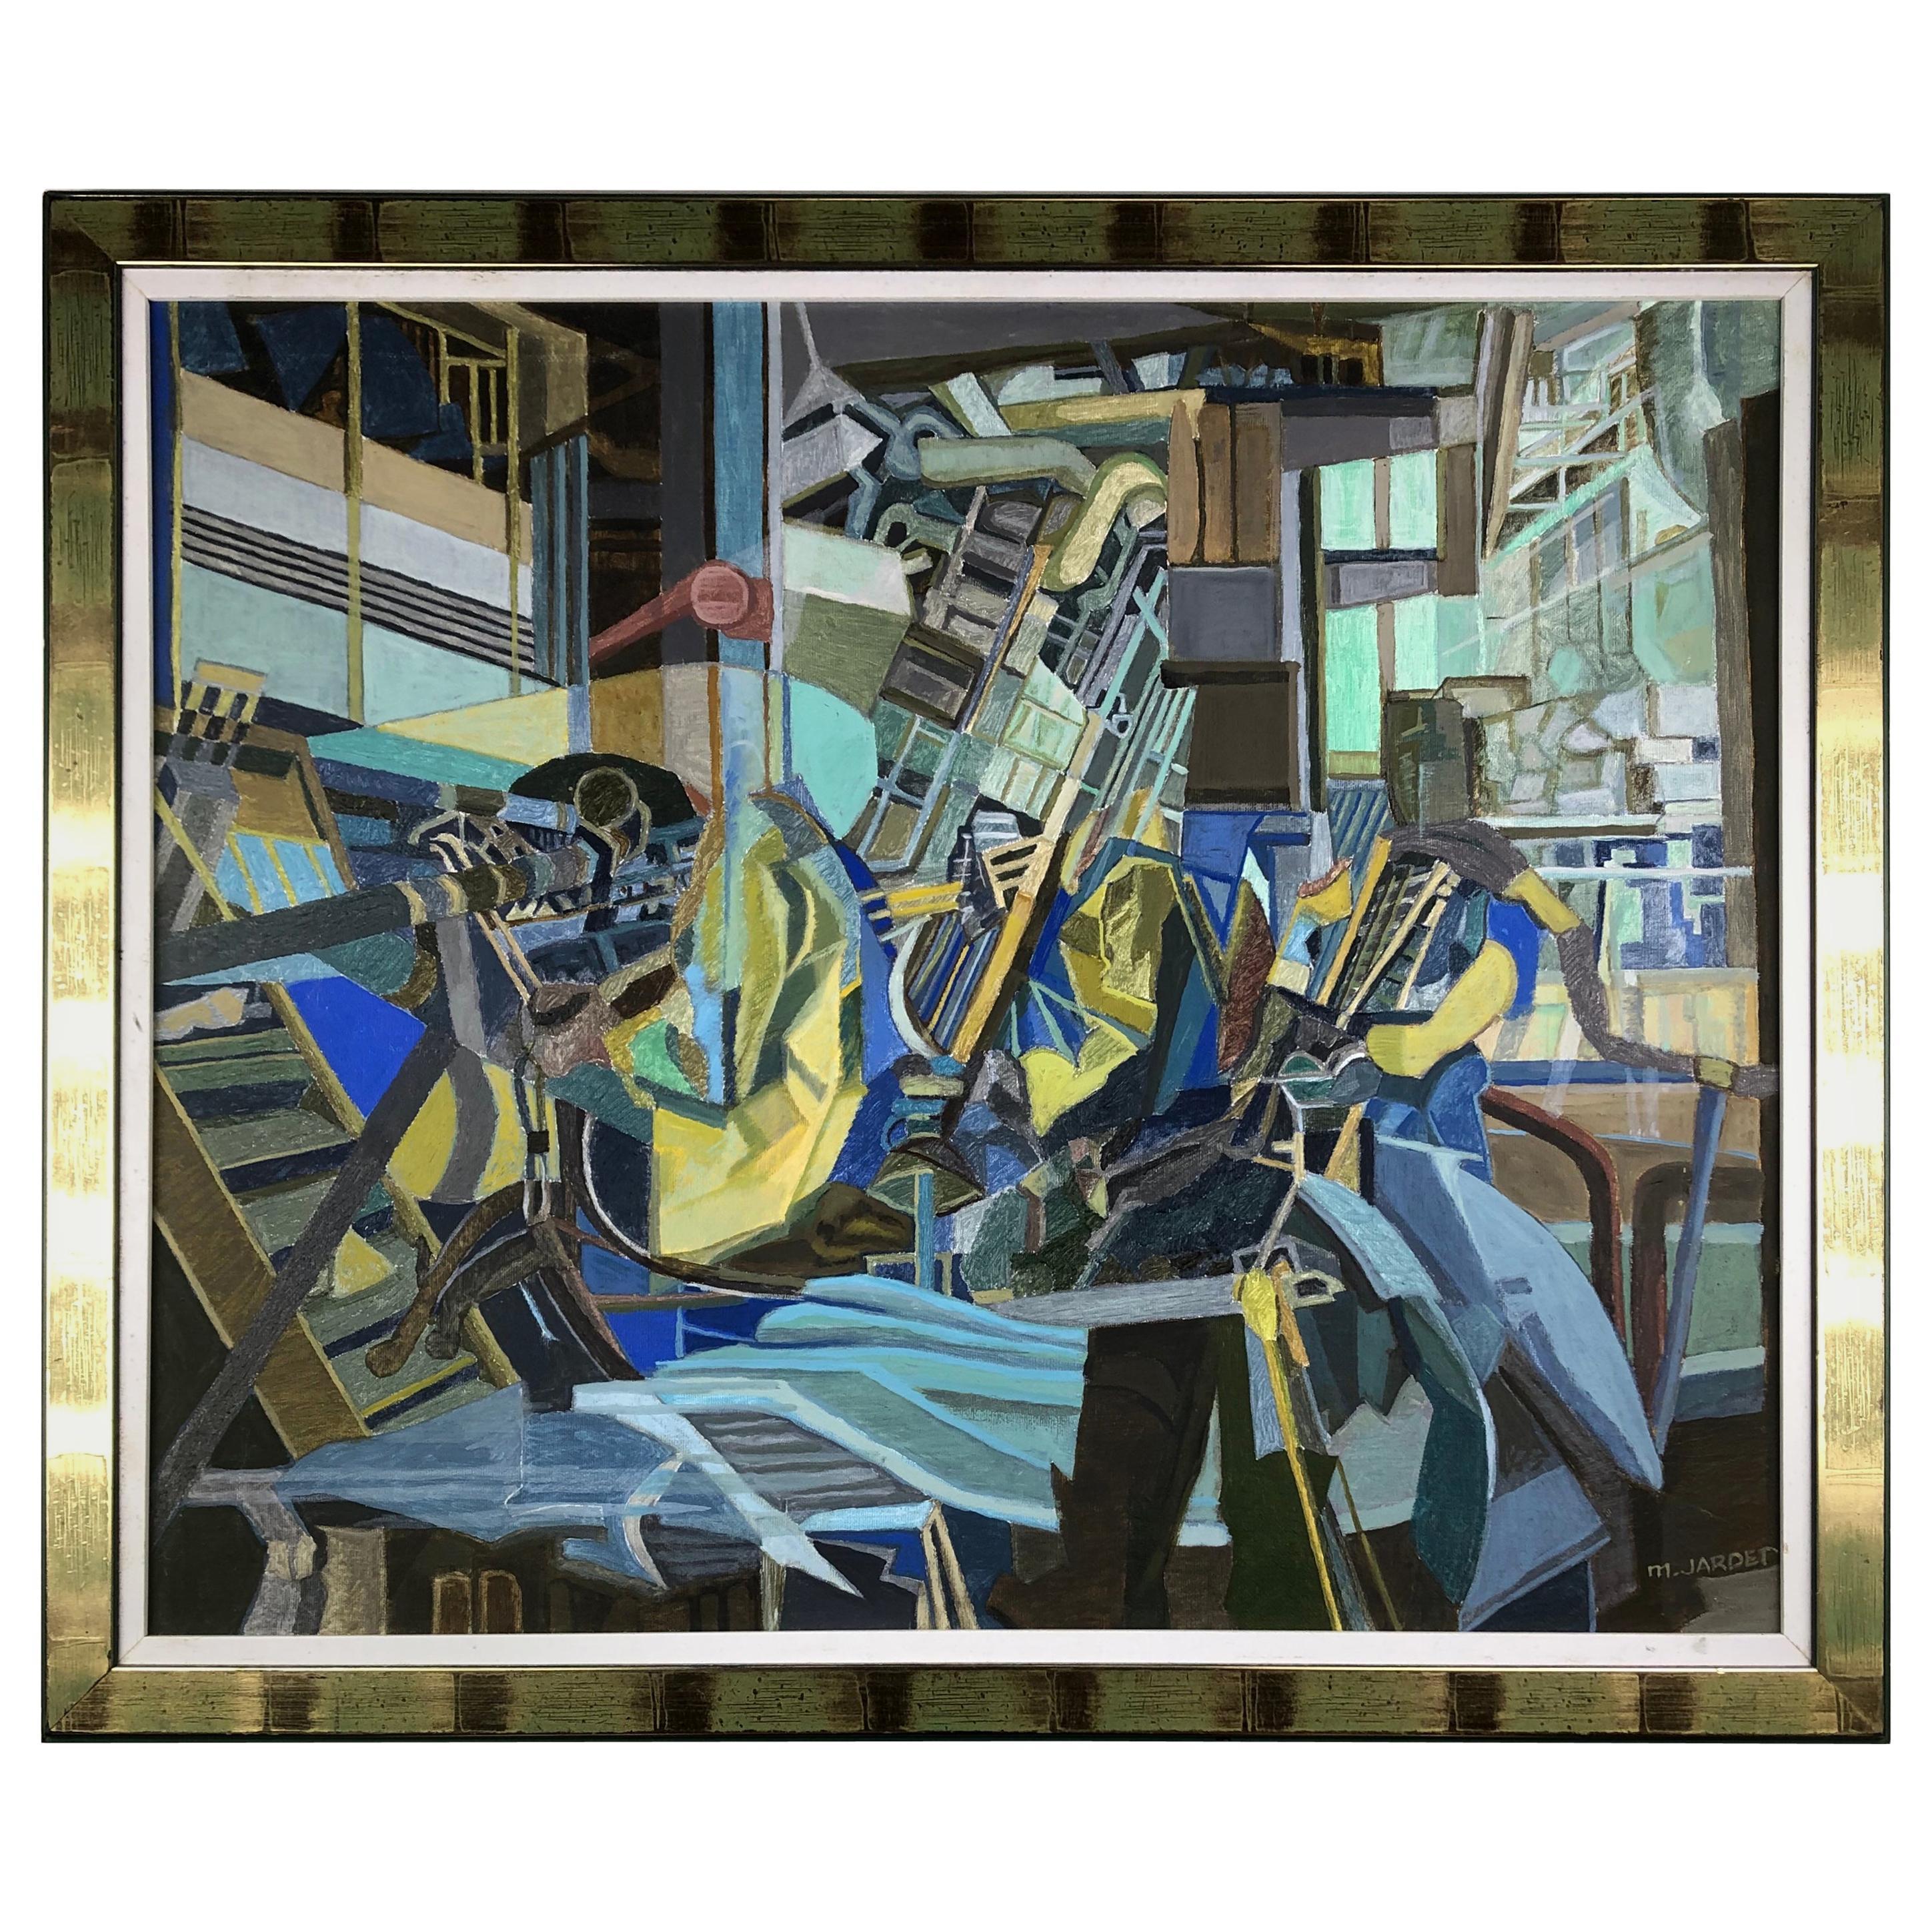 Original Marc Jardet Painting, Abstract Cubism circa 1960, Manner Jacques Villon